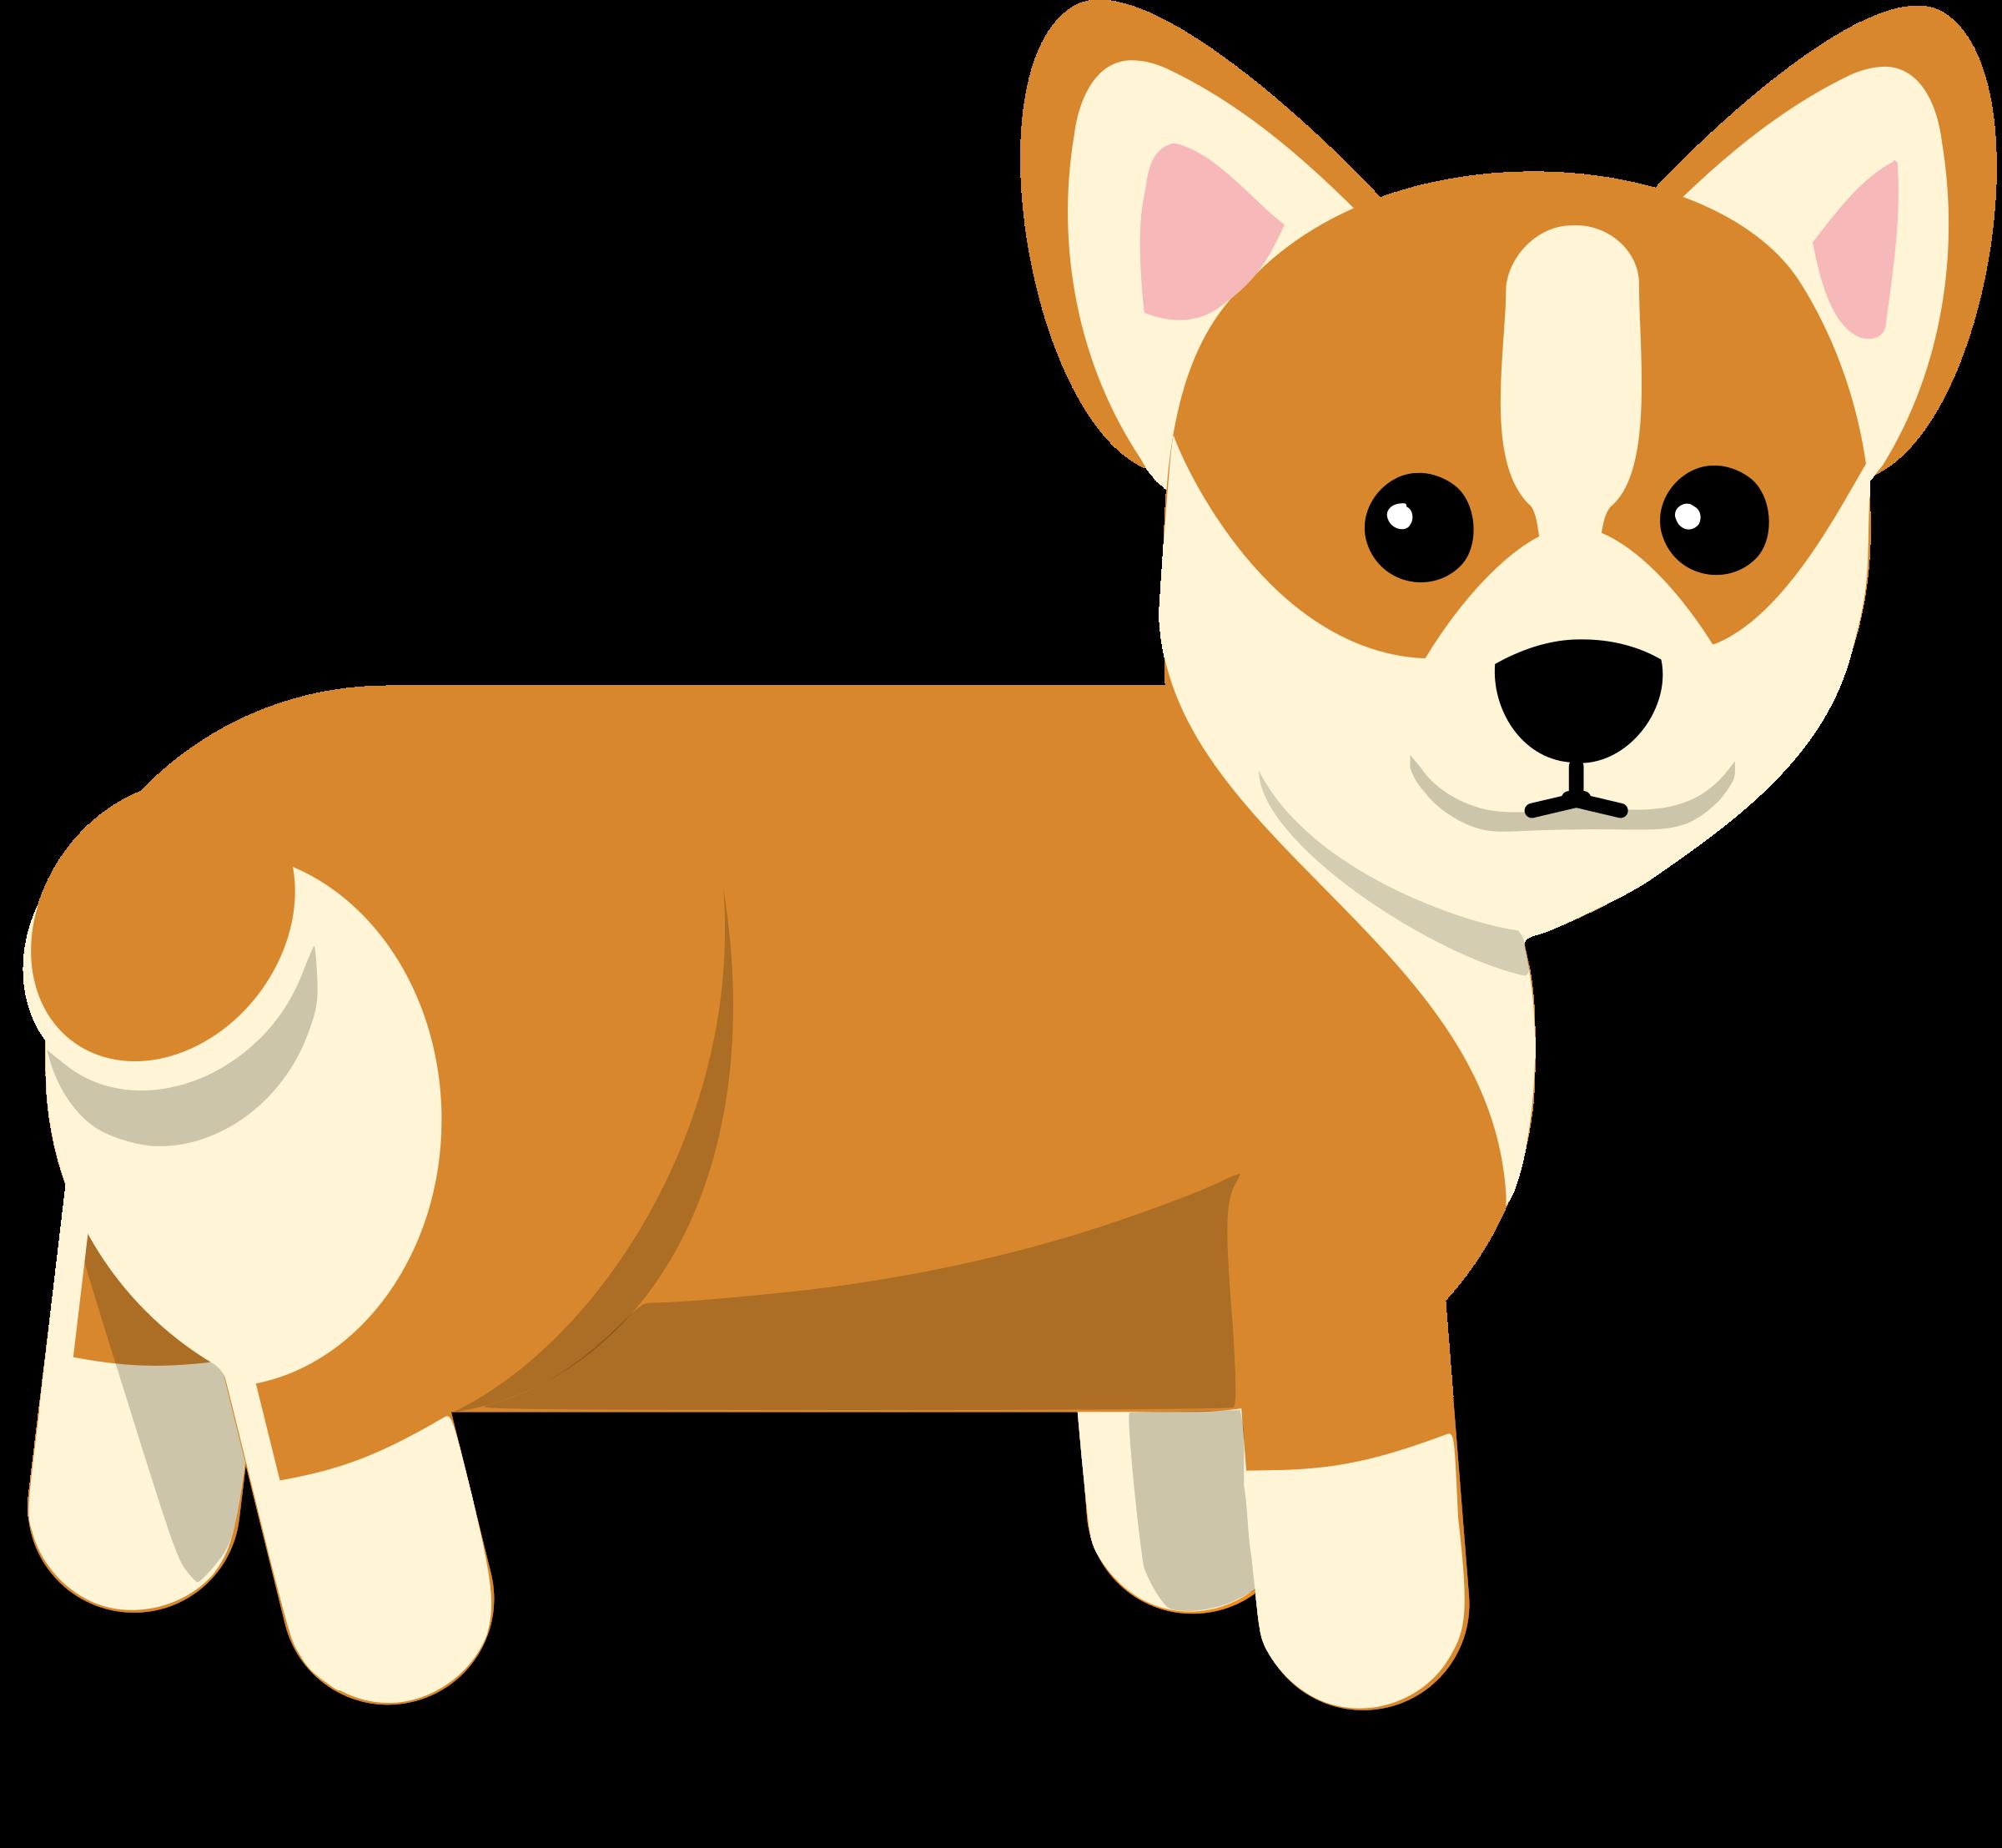 Free Corgi Dog Cliparts, Download Free Clip Art, Free Clip.